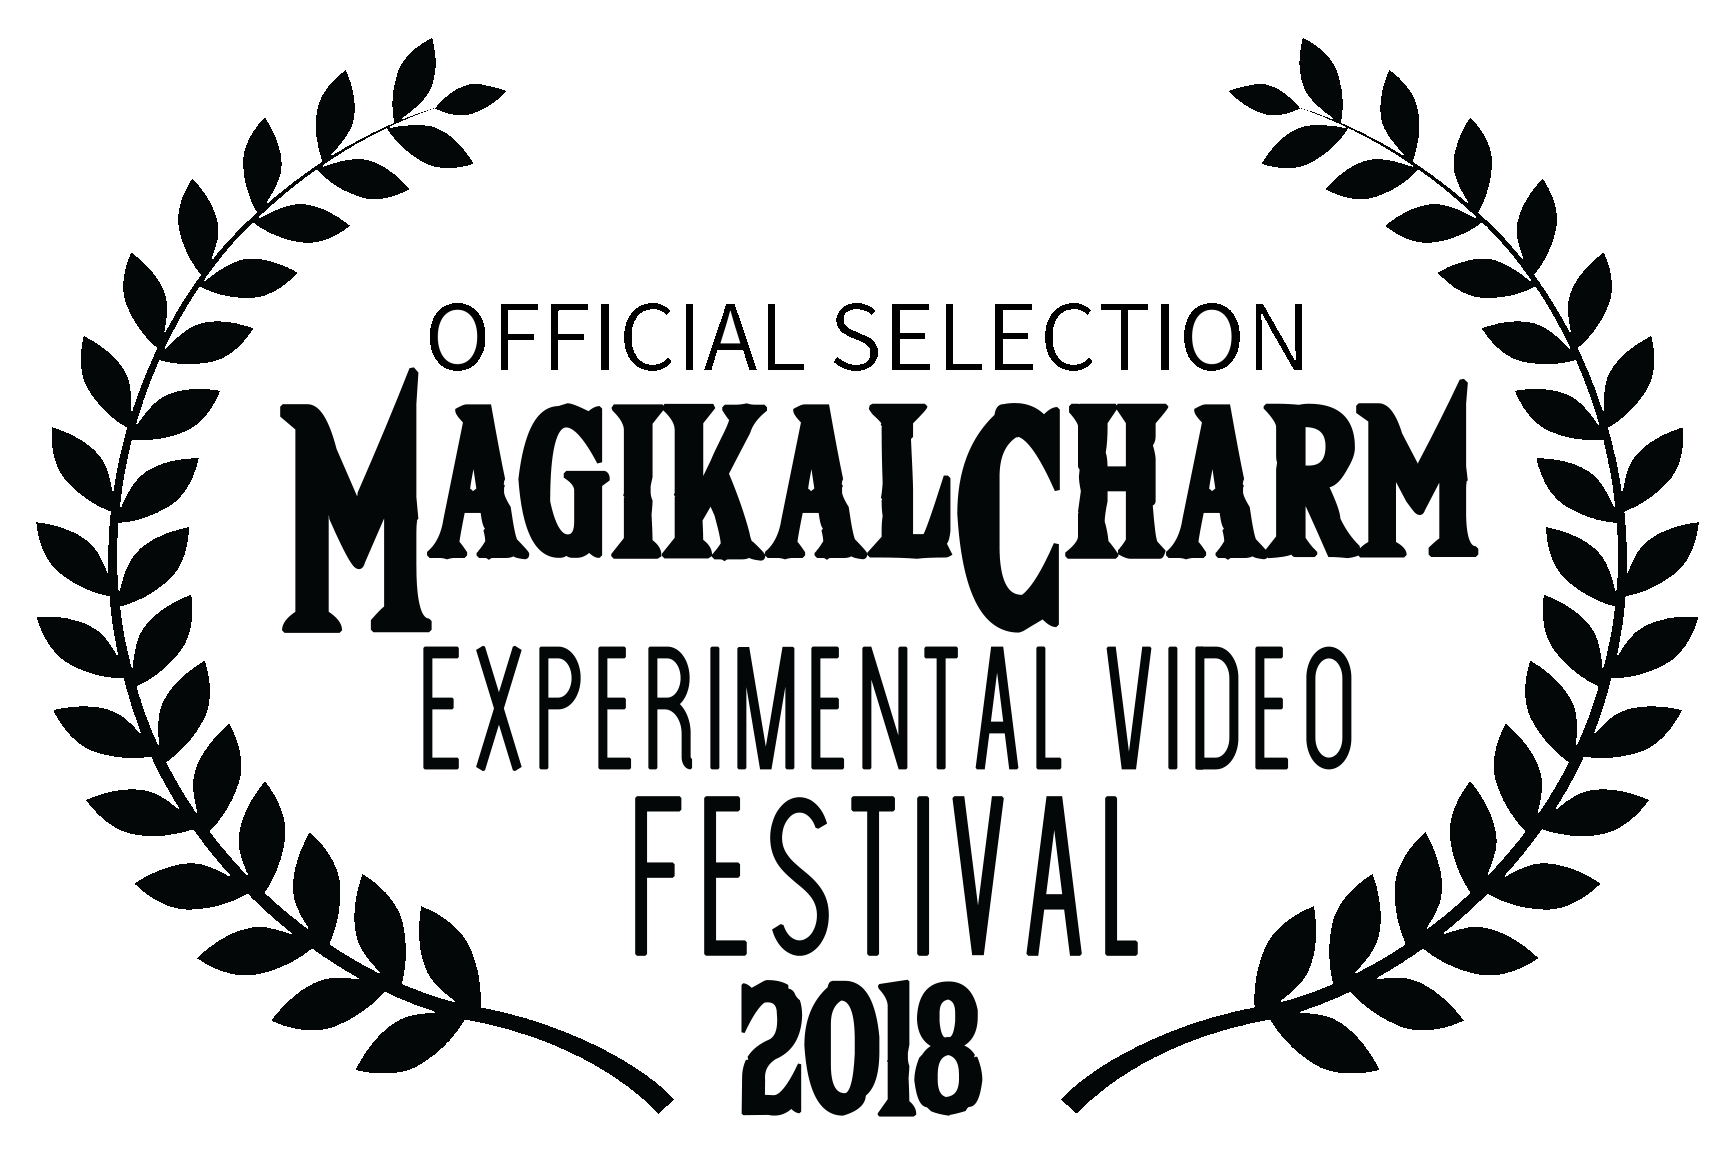 official-selection-calcutta-international-cult-film-festival-2017 copy.png